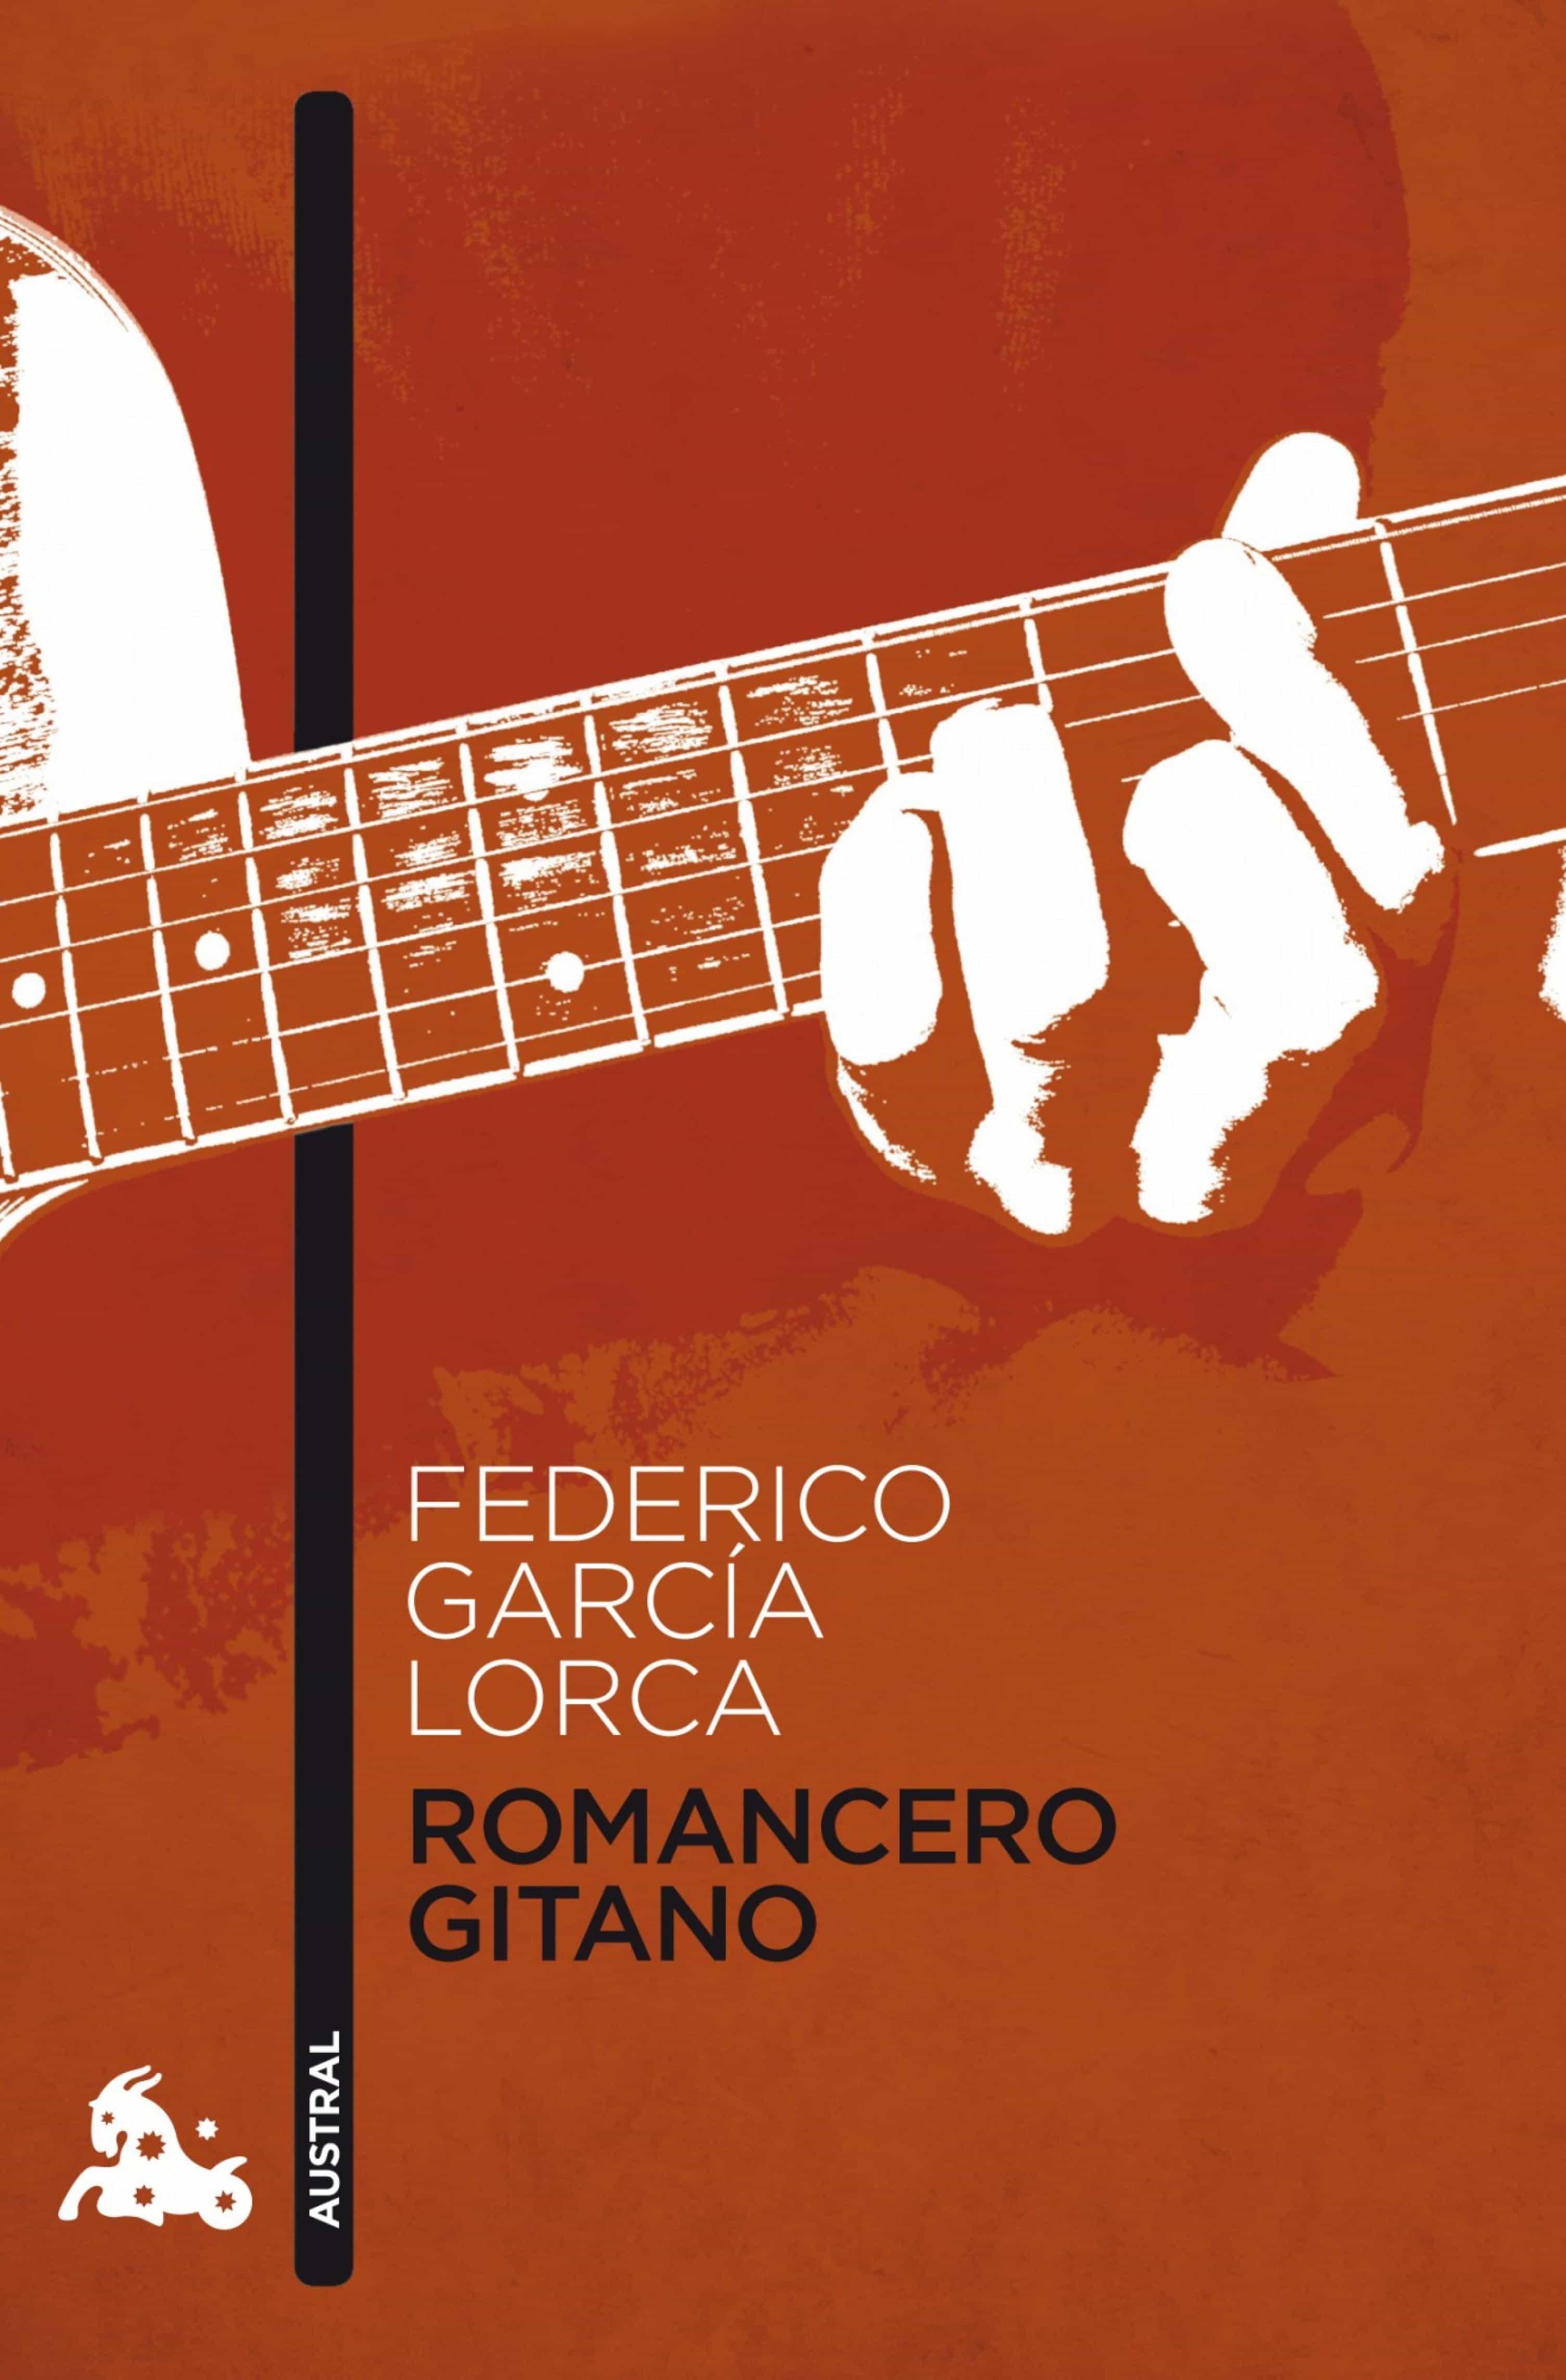 Romancero gitano ebook federico garcia lorca 9788467045048